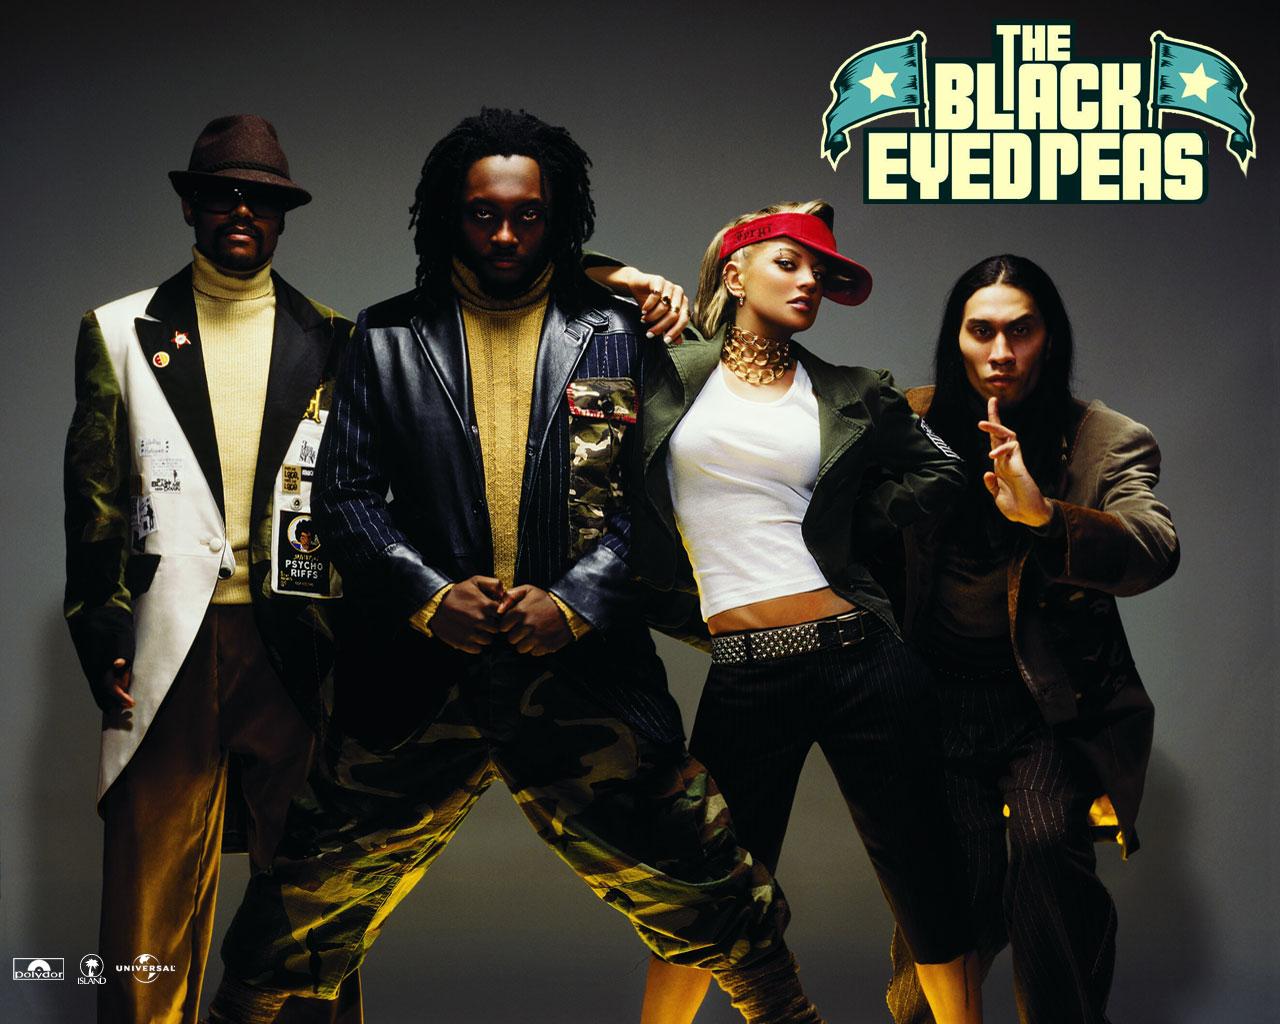 https://i1.wp.com/www.weesk.com/wallpaper/musique/black-eyed-peas/black-eyed-peas-black-eyed-peas-musique.jpg